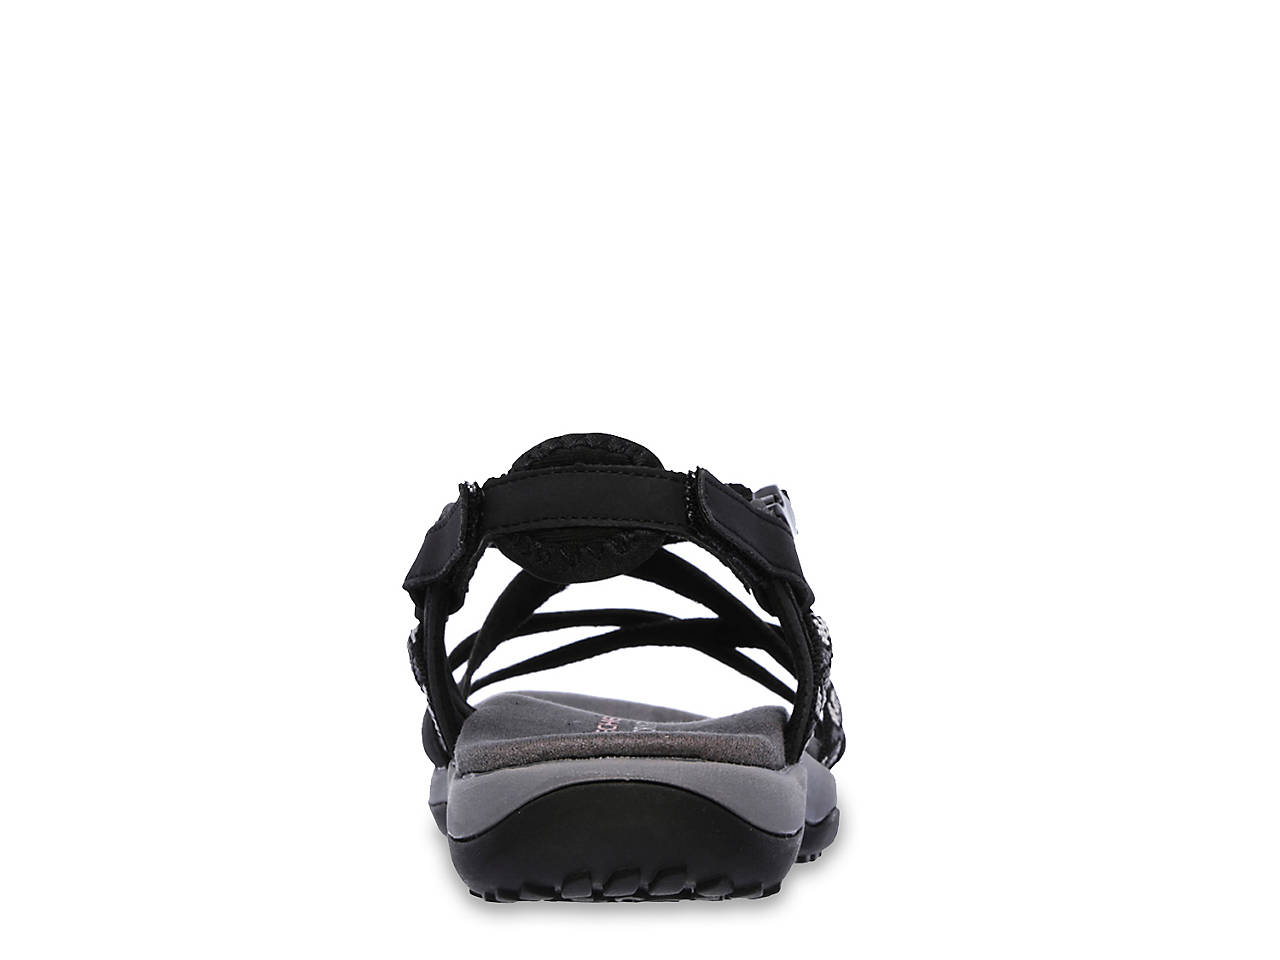 0829f024711 Skechers Reggae Slim-Vacay Sandal Women s Shoes